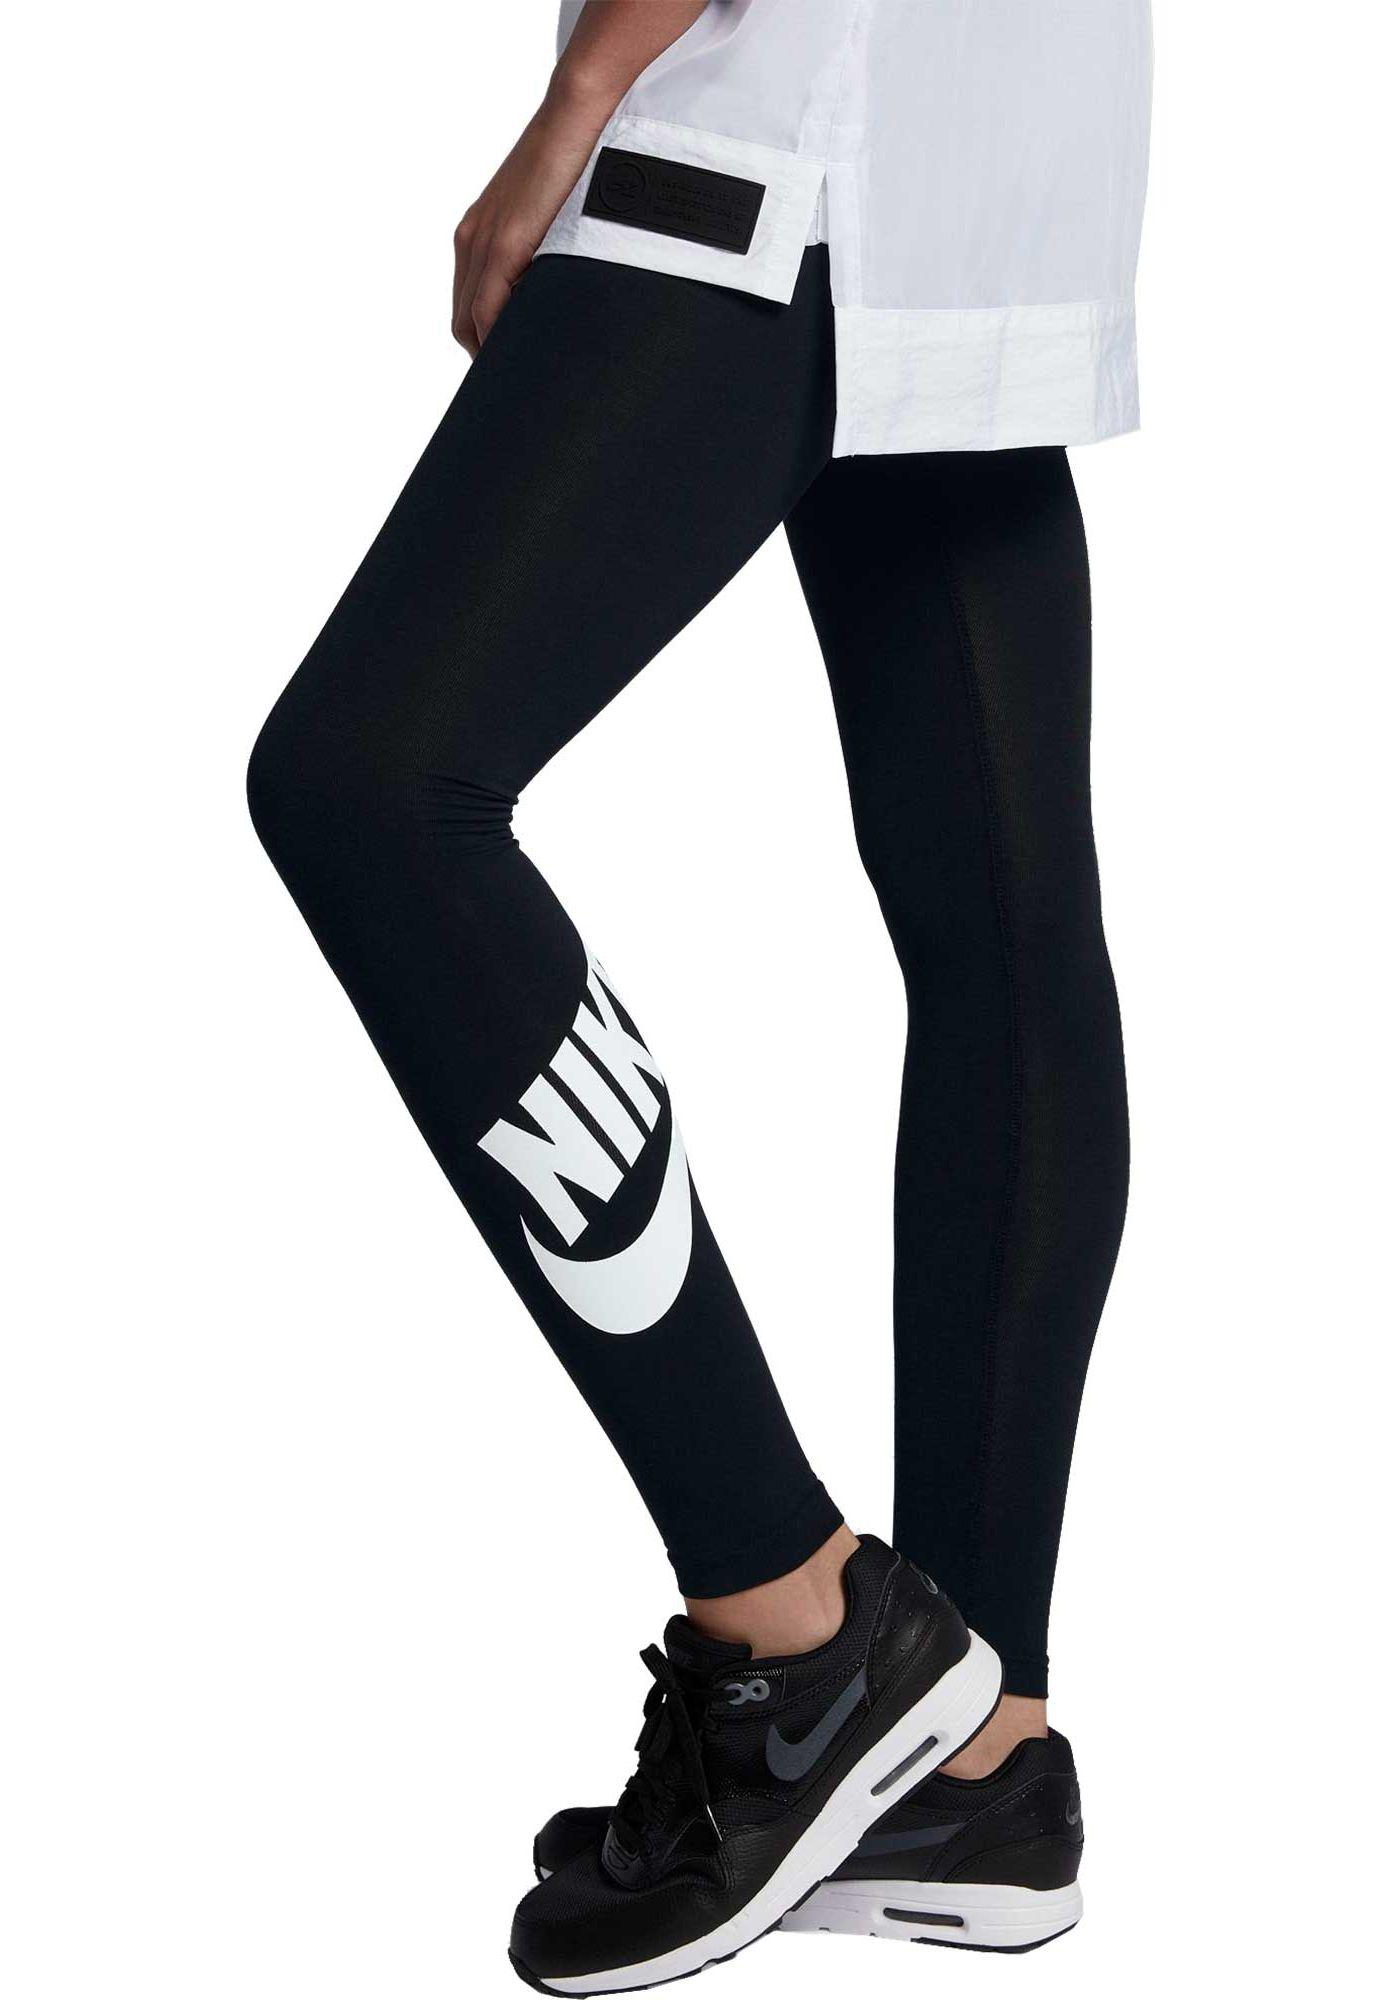 Nike Women's Sportswear High Waisted Leg-A-See Graphic Tights